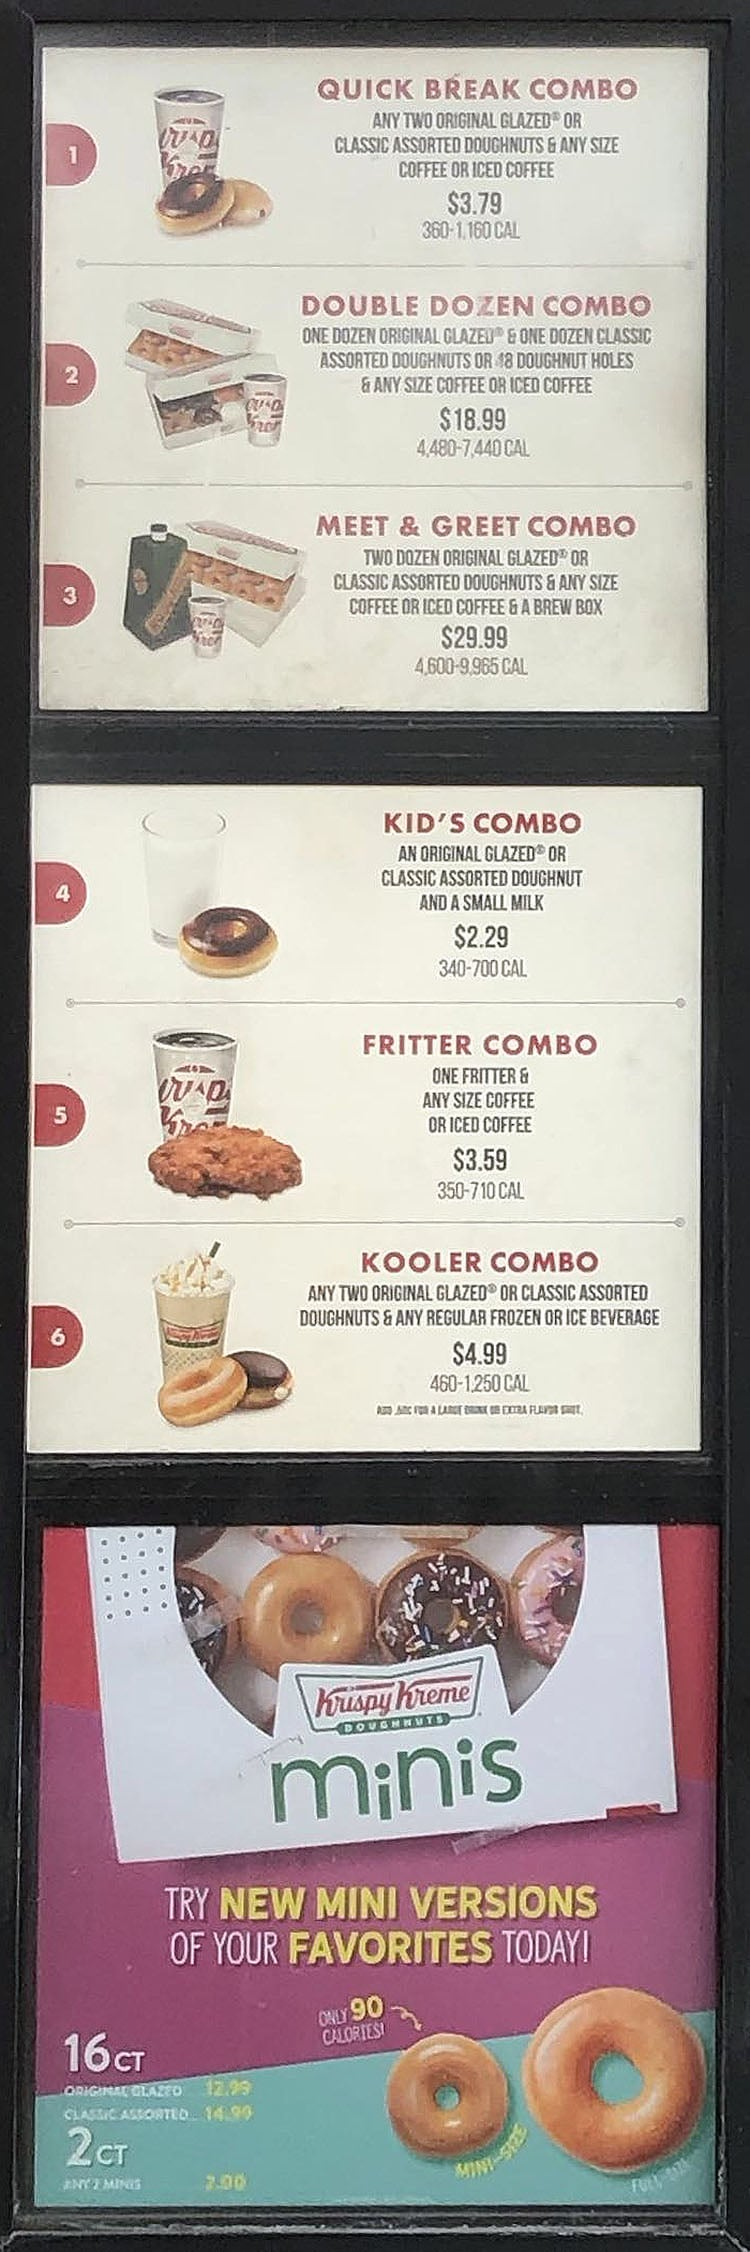 Krispy Kreme menu - combos